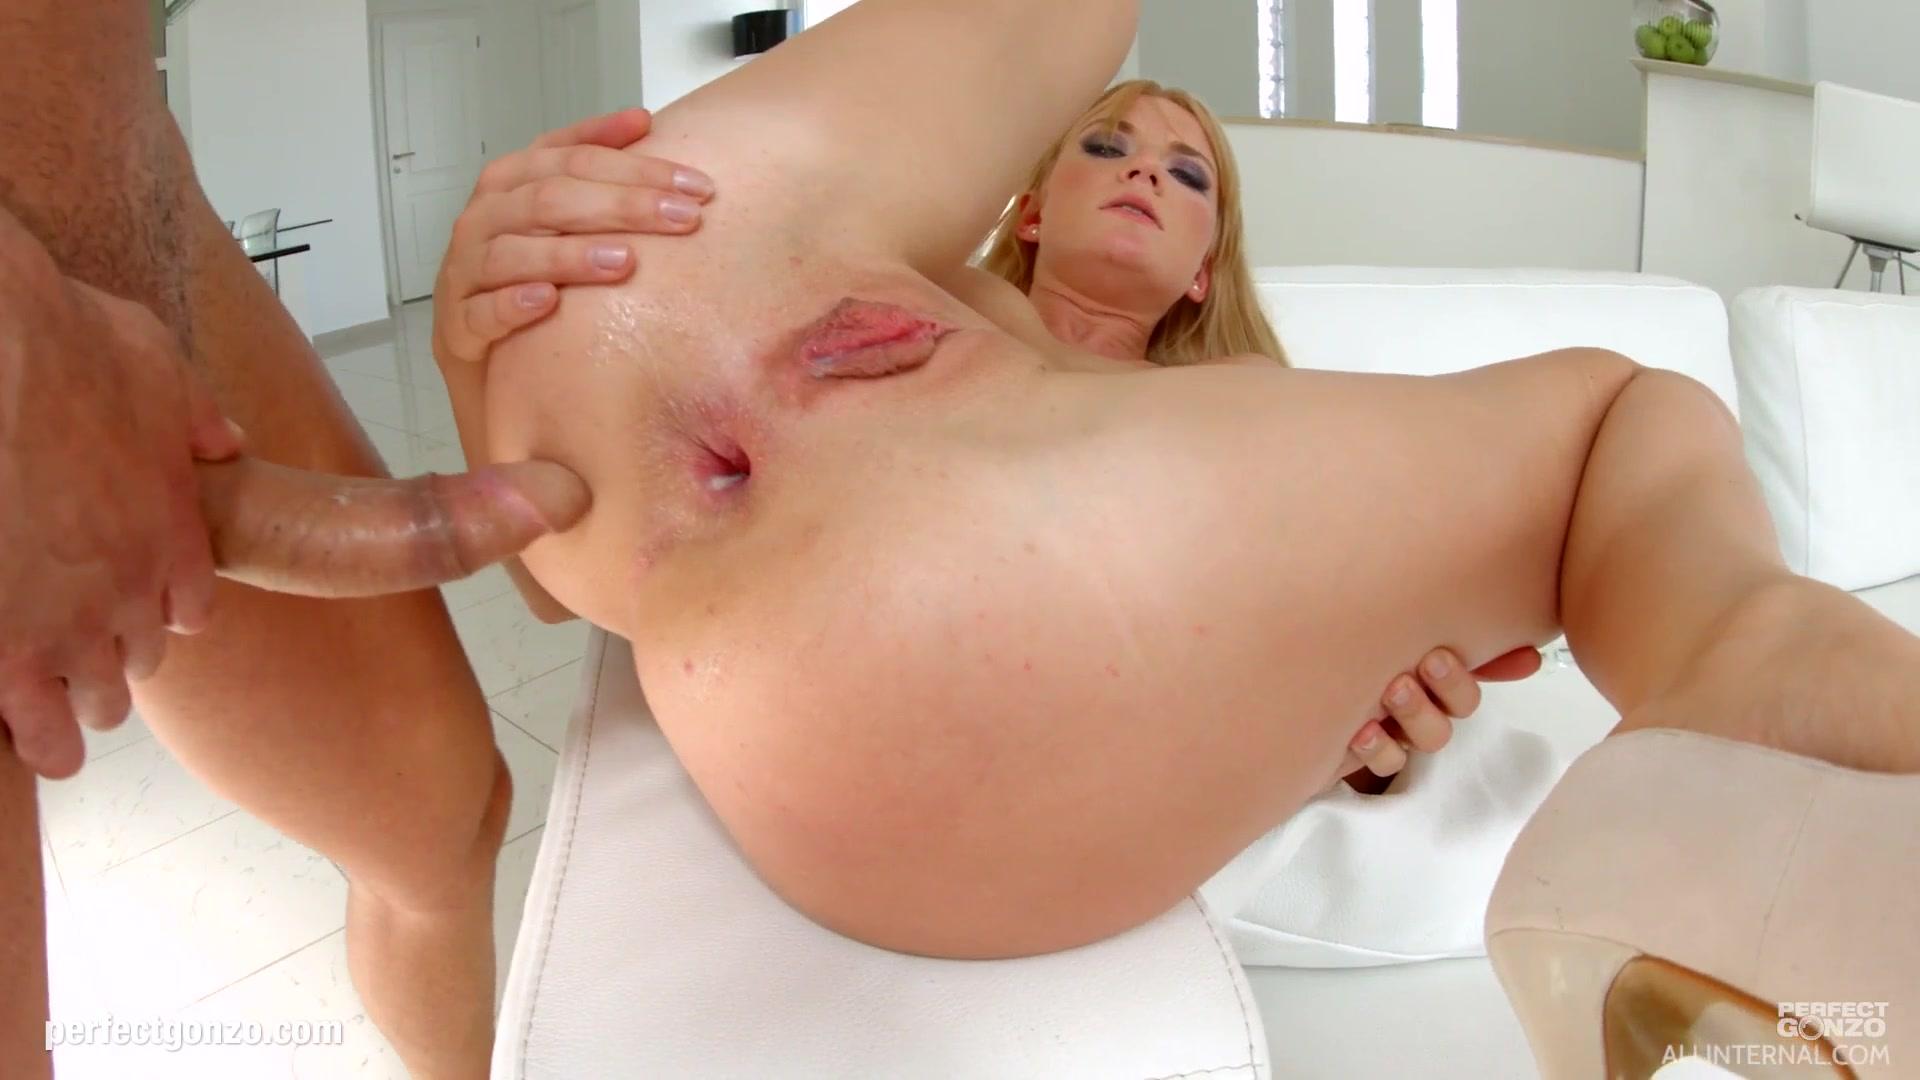 Naked 18+ Gallery Big breast videos com